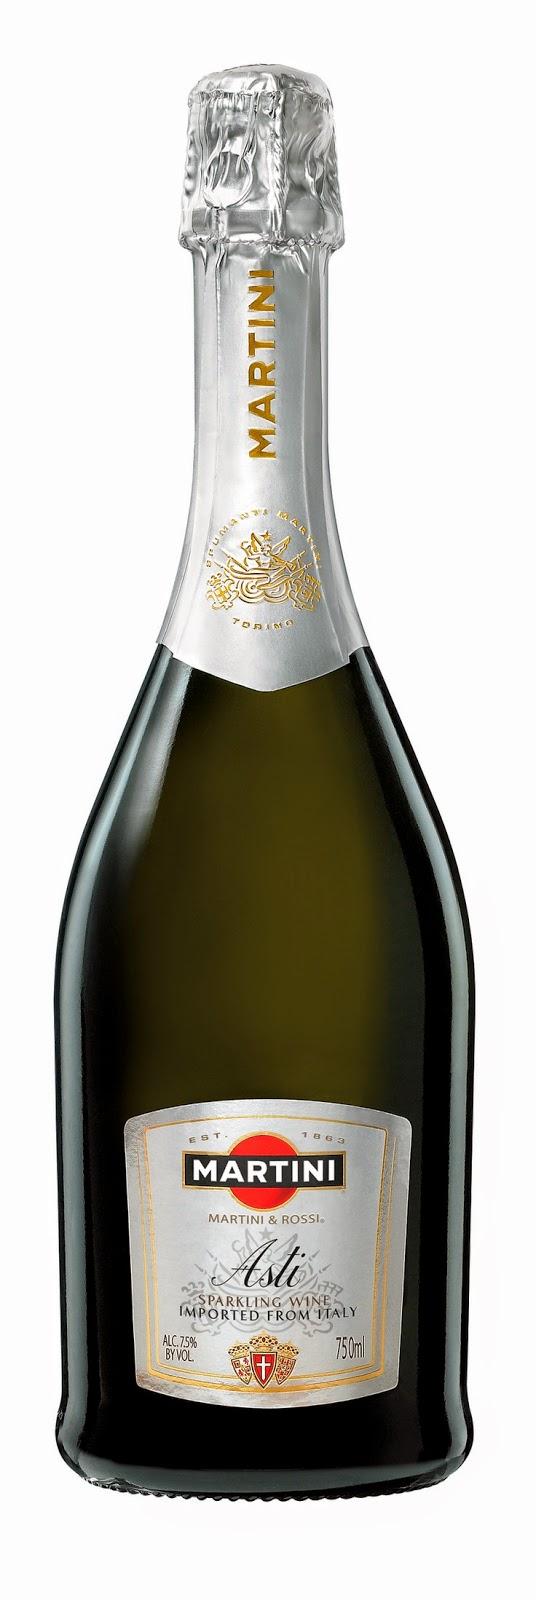 george clooney la grande bellezza spumante martini party packaging marketing label